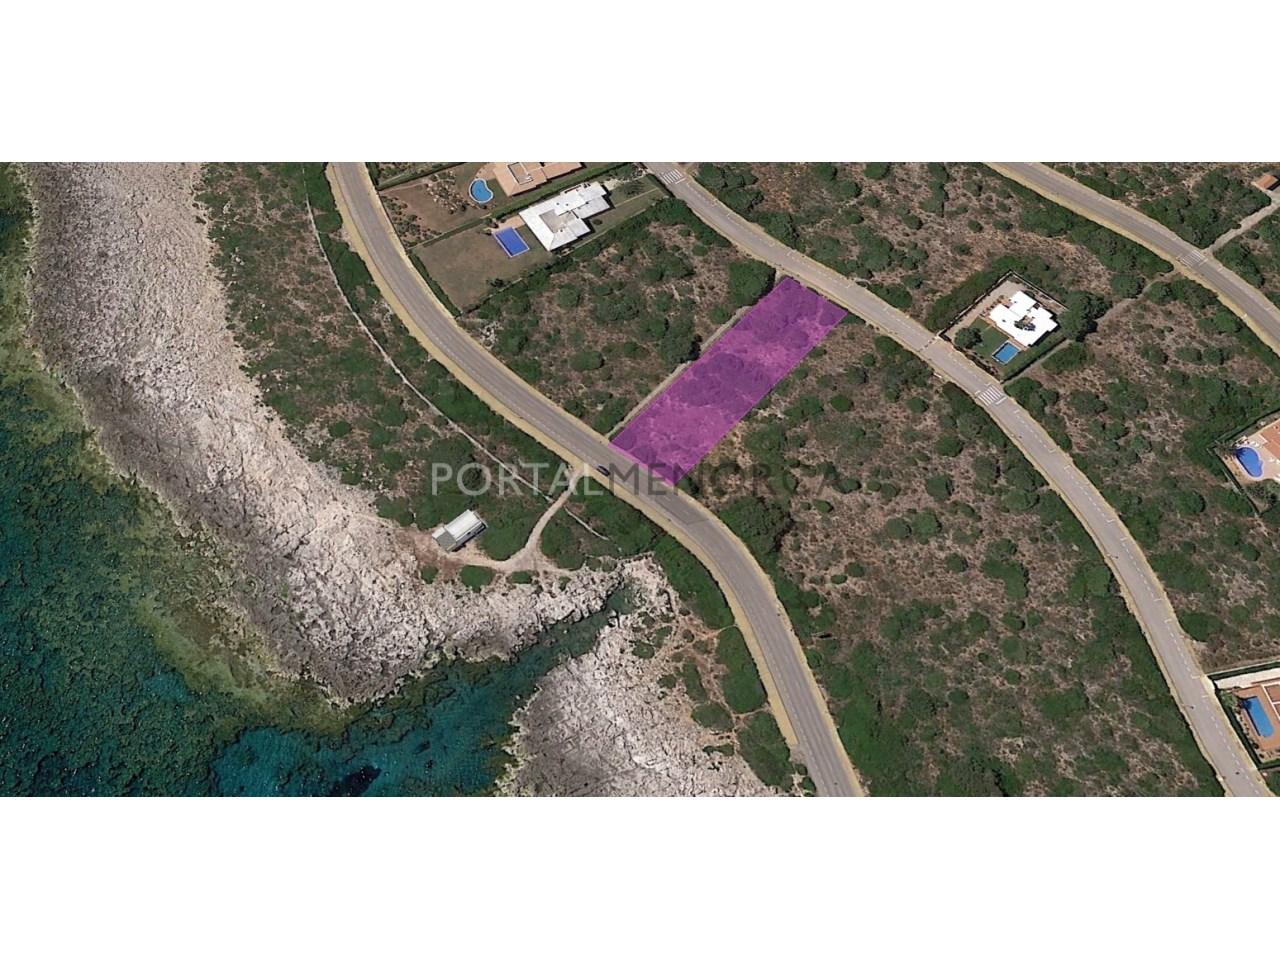 Sea front plot of land for sale in Torret de Baix